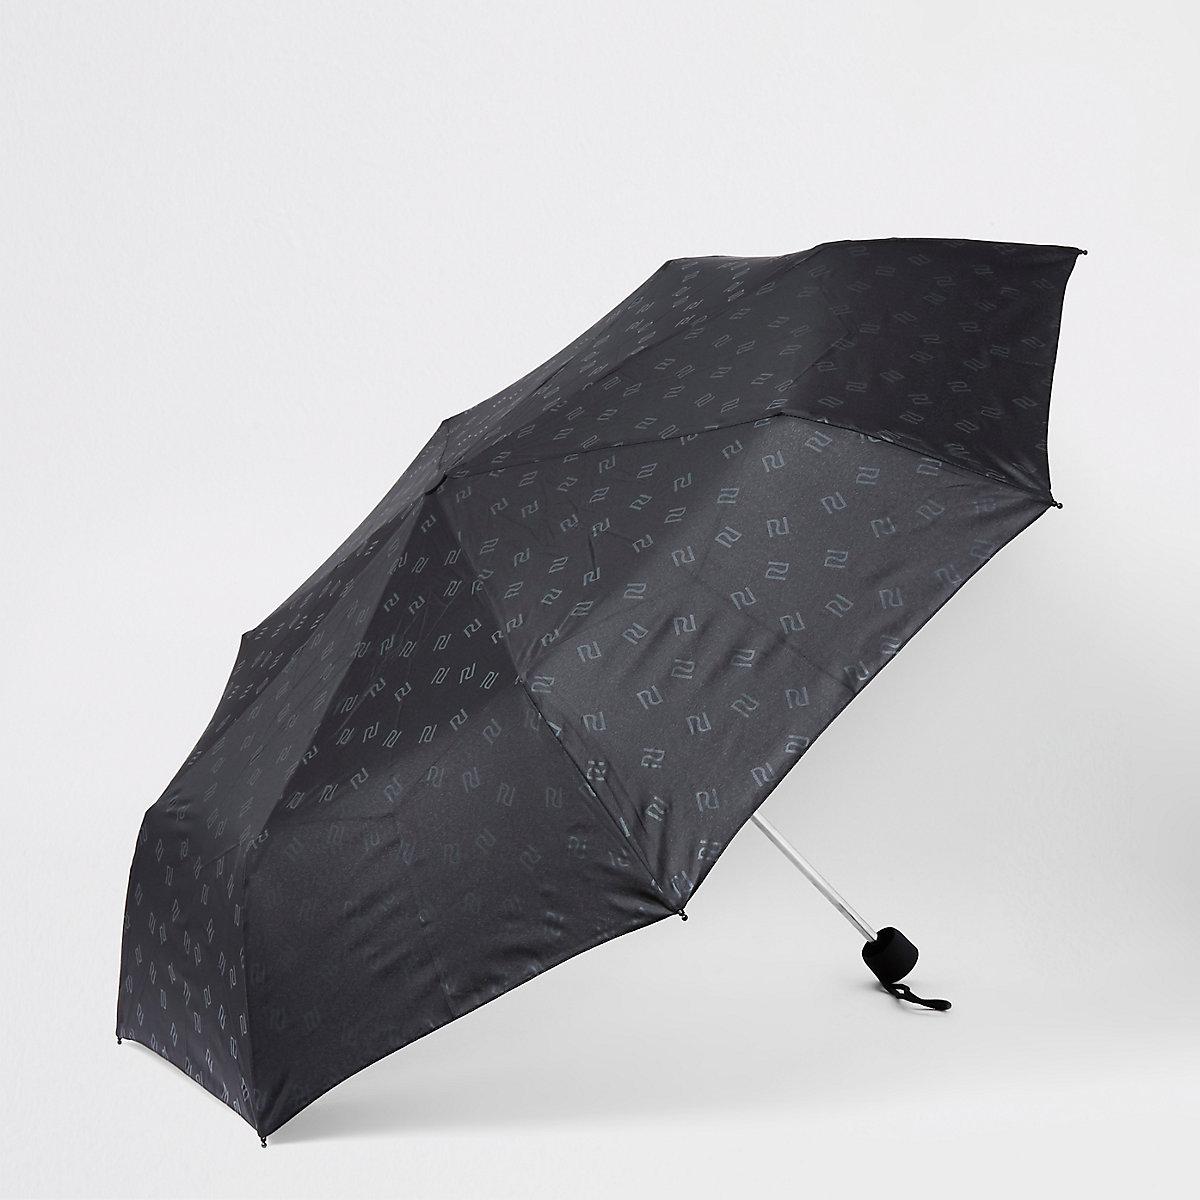 Schwarzer, kompakter Regenschirm